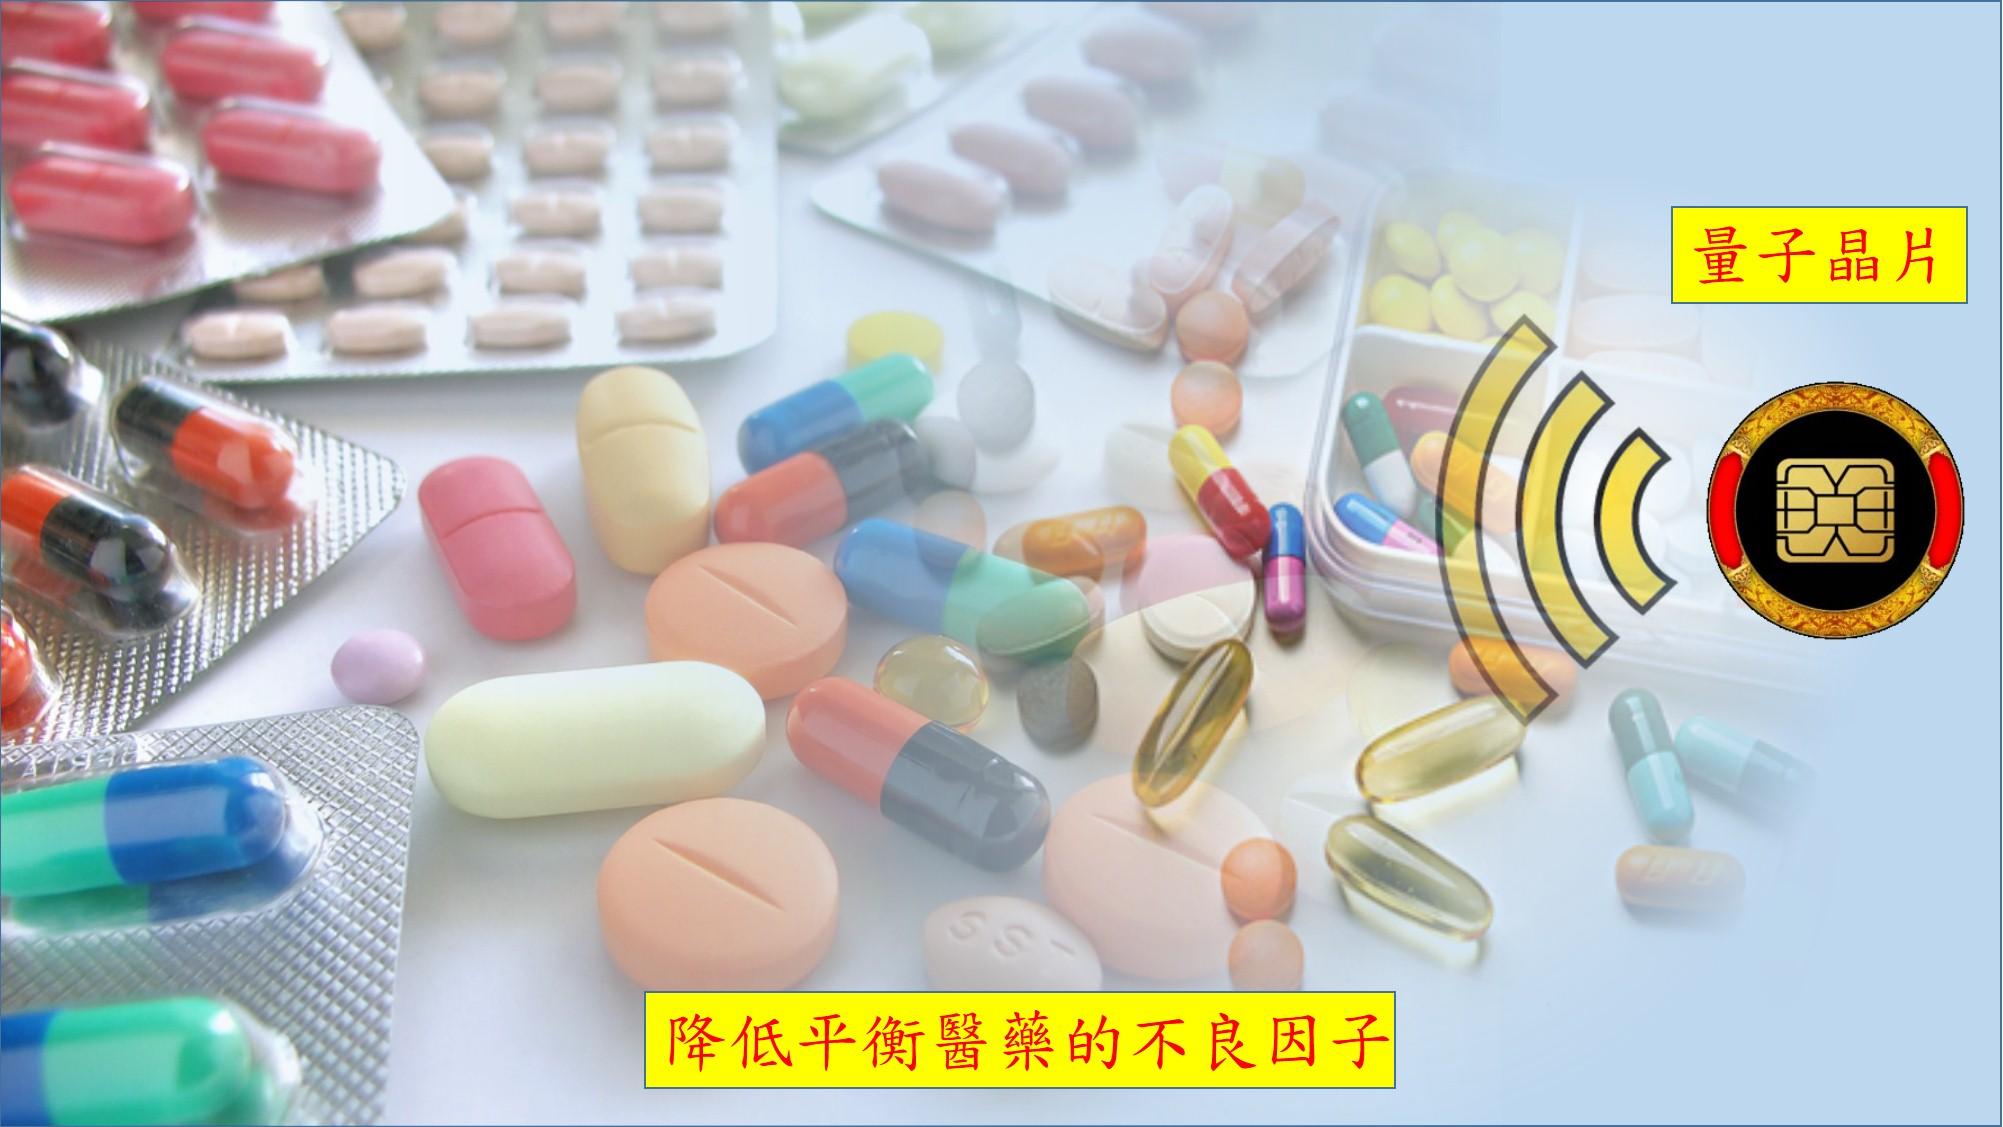 http://taiwancom.tw/biochip/biowell-21.jpg